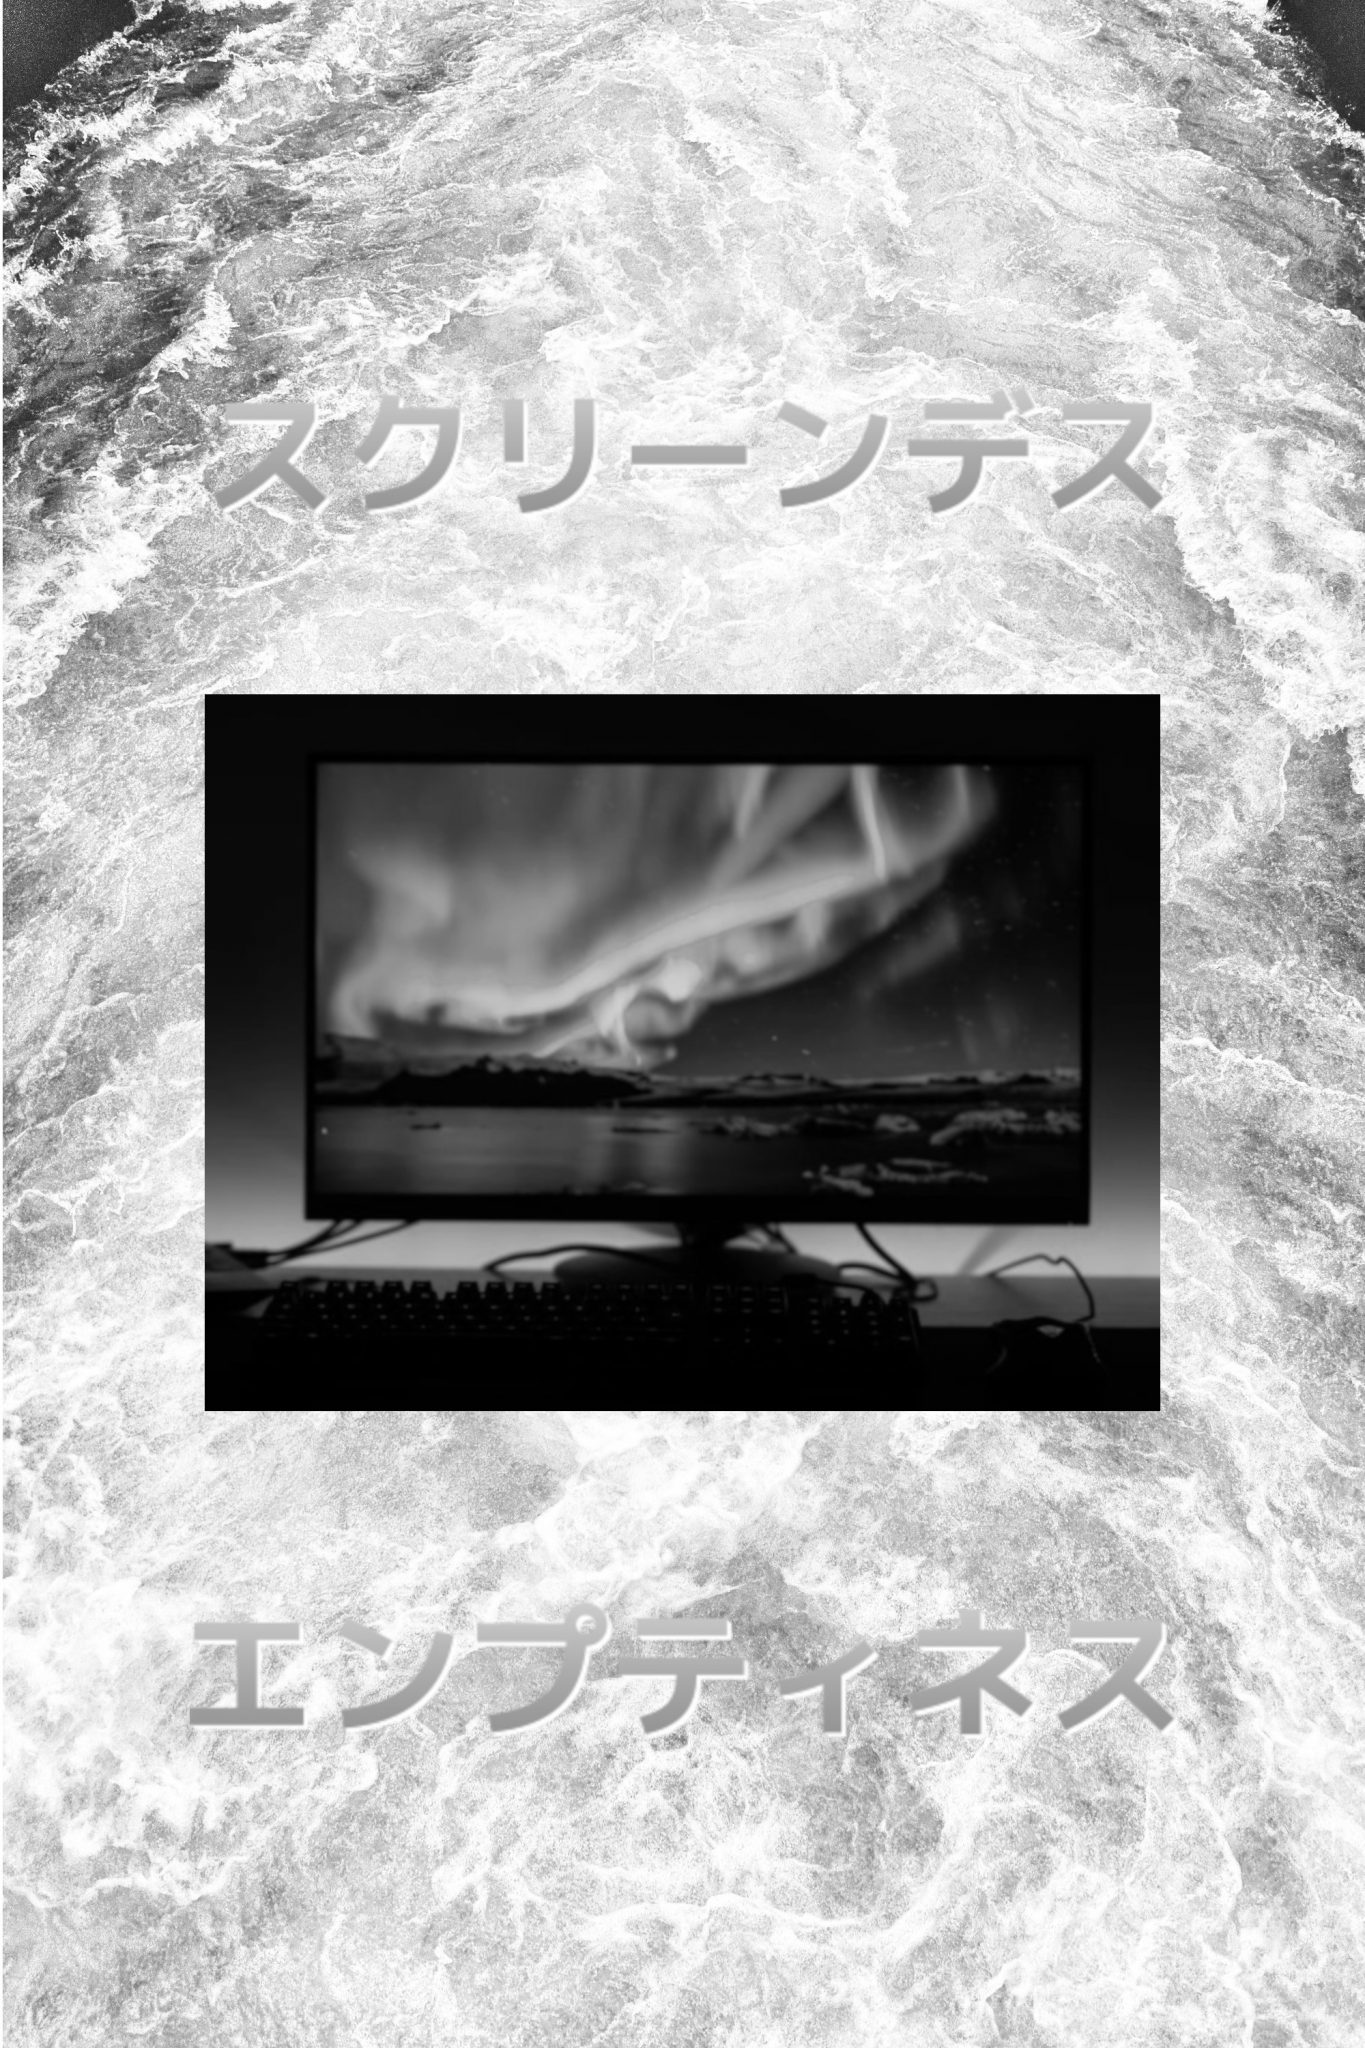 Series of Dreams 𝑏𝑦 Kagami Smile